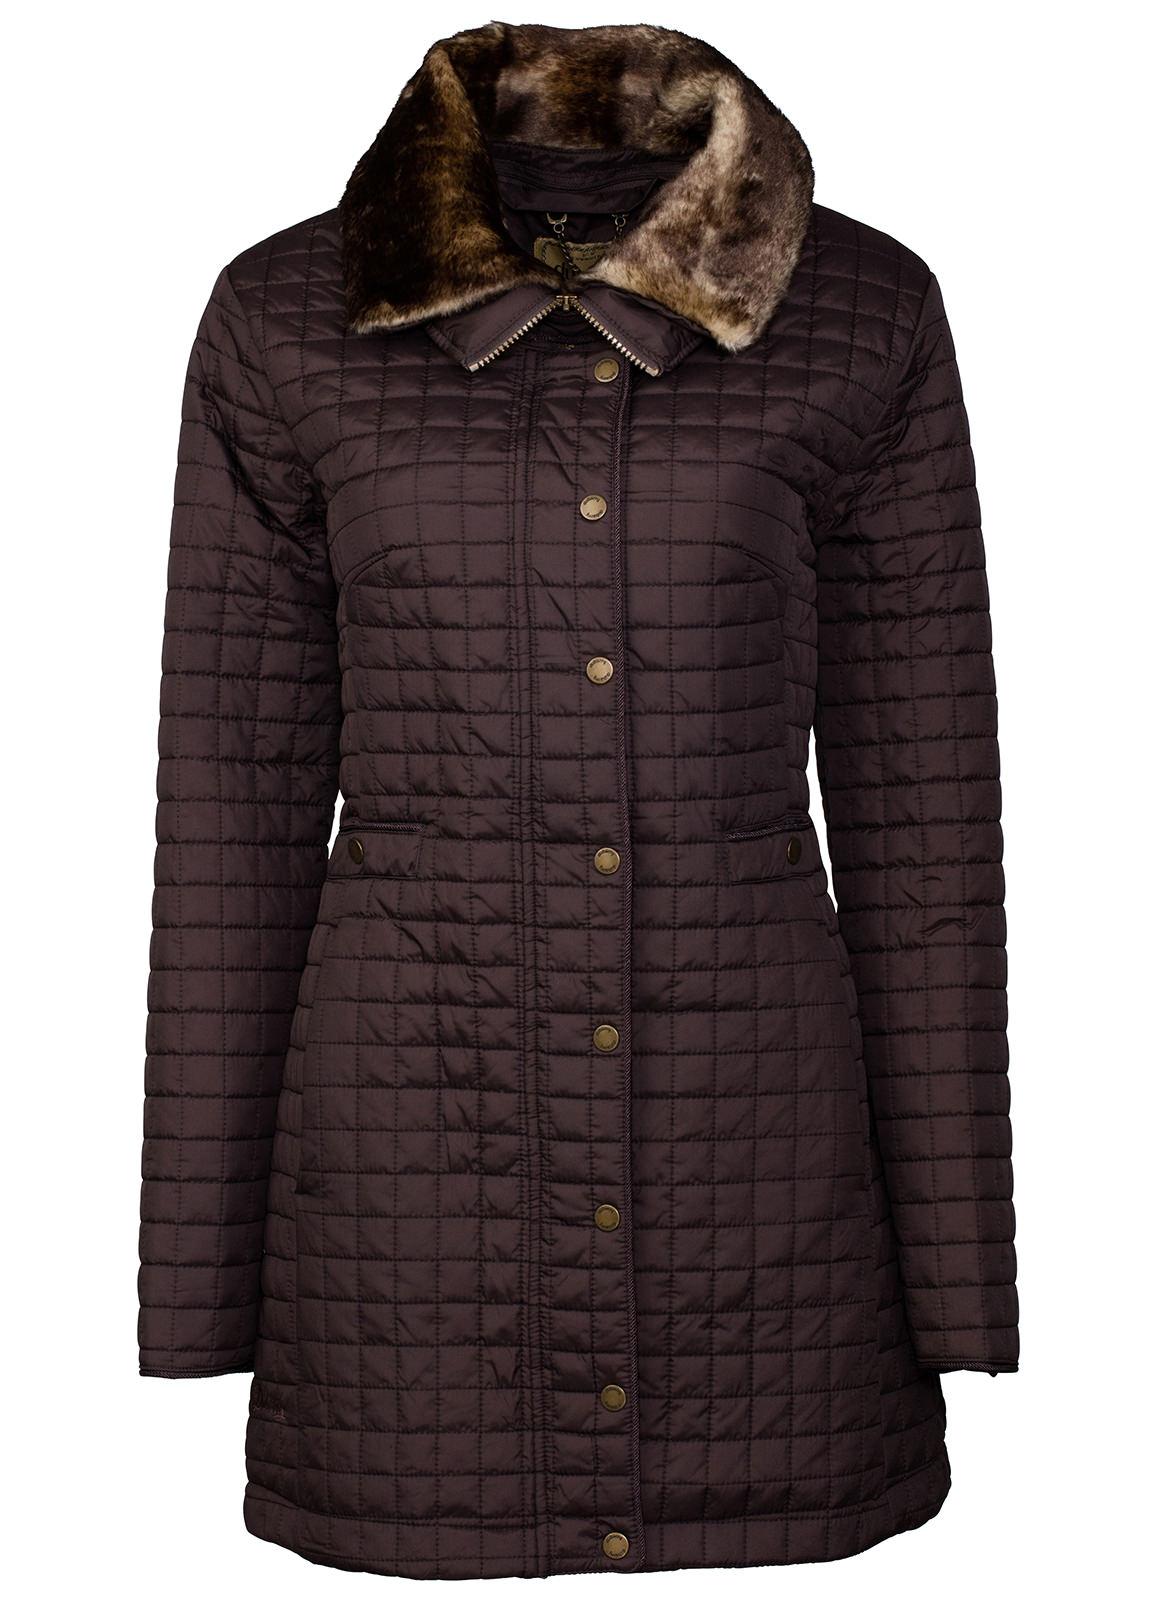 Dubarry_ Abbey Women's Quilted Jacket - Mocha_Image_2